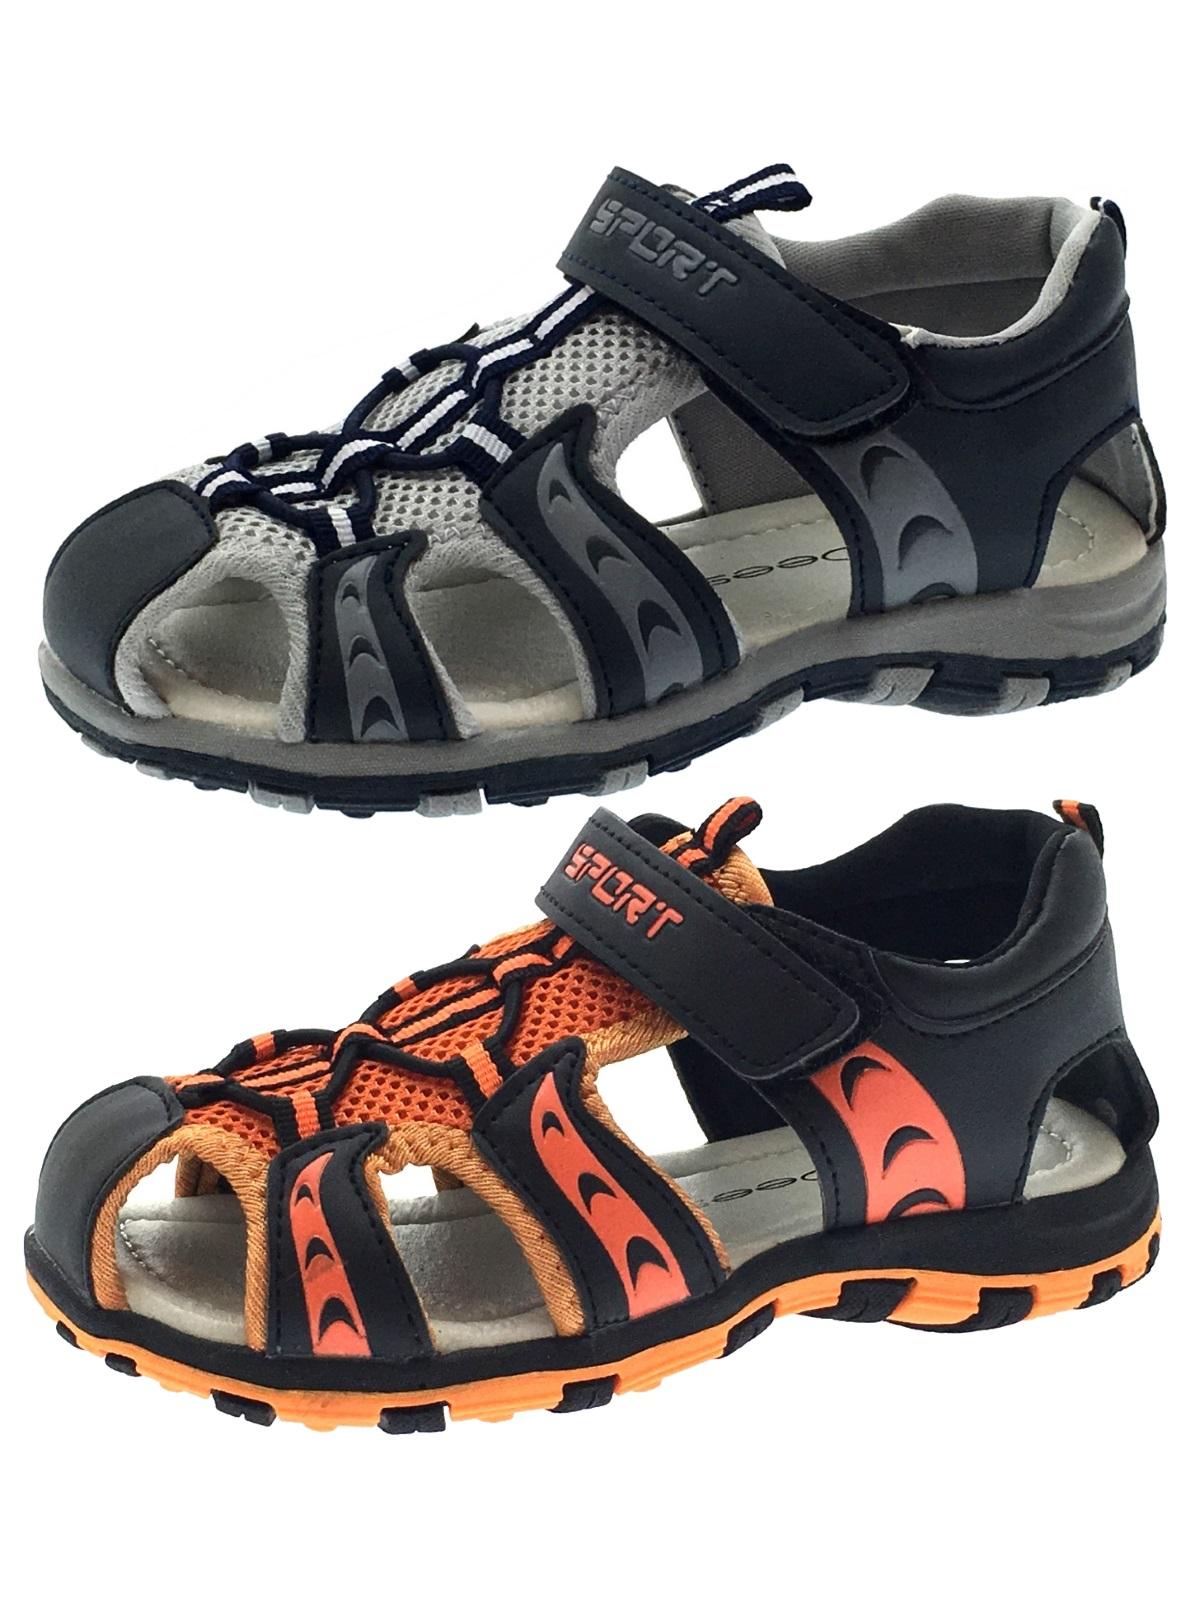 Boys Sports Sandals Closed Toe Walking Comfort Casual